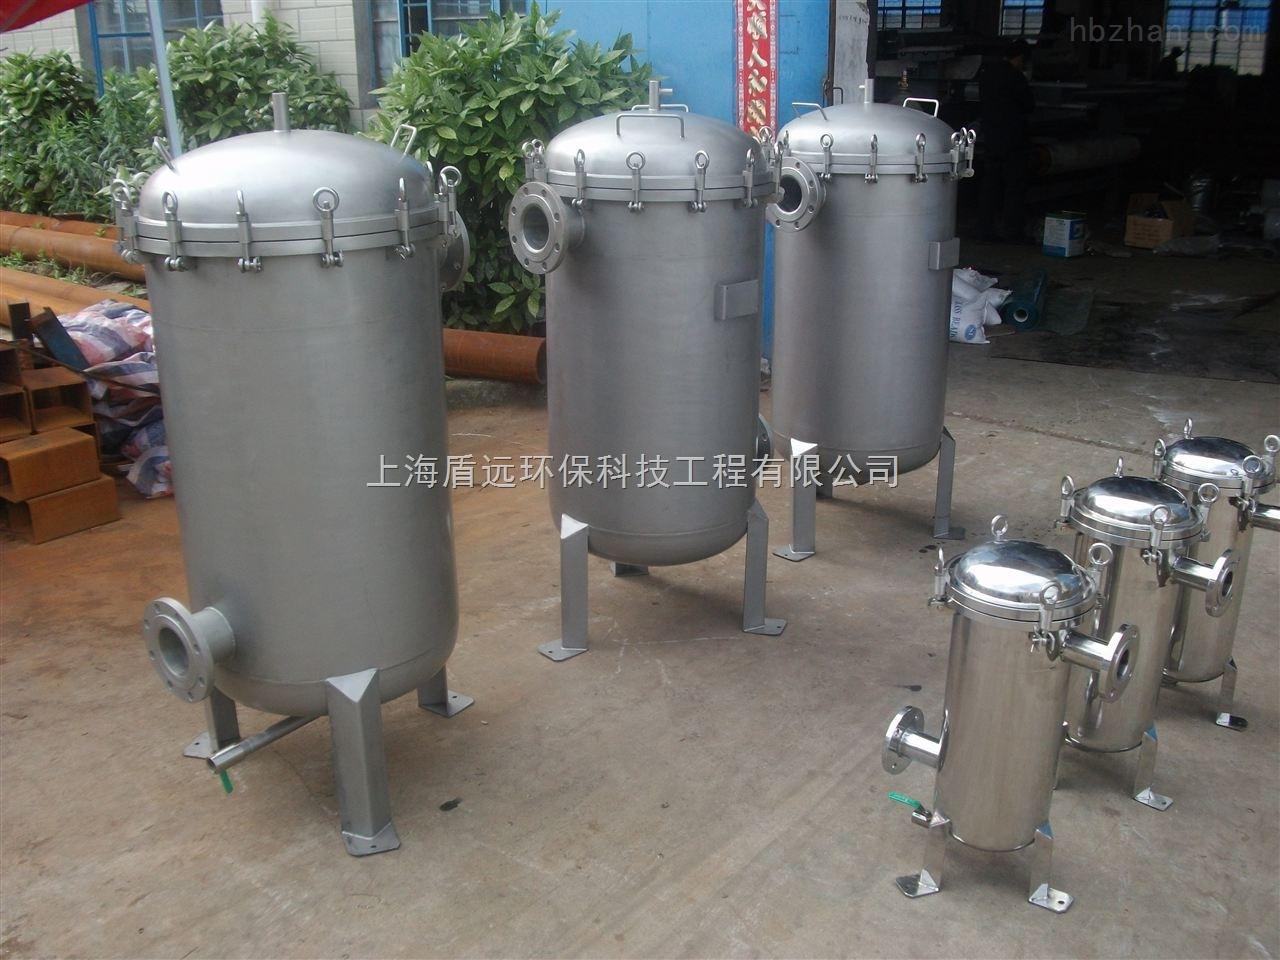 DL-1P1S1P1S上海袋式过滤器